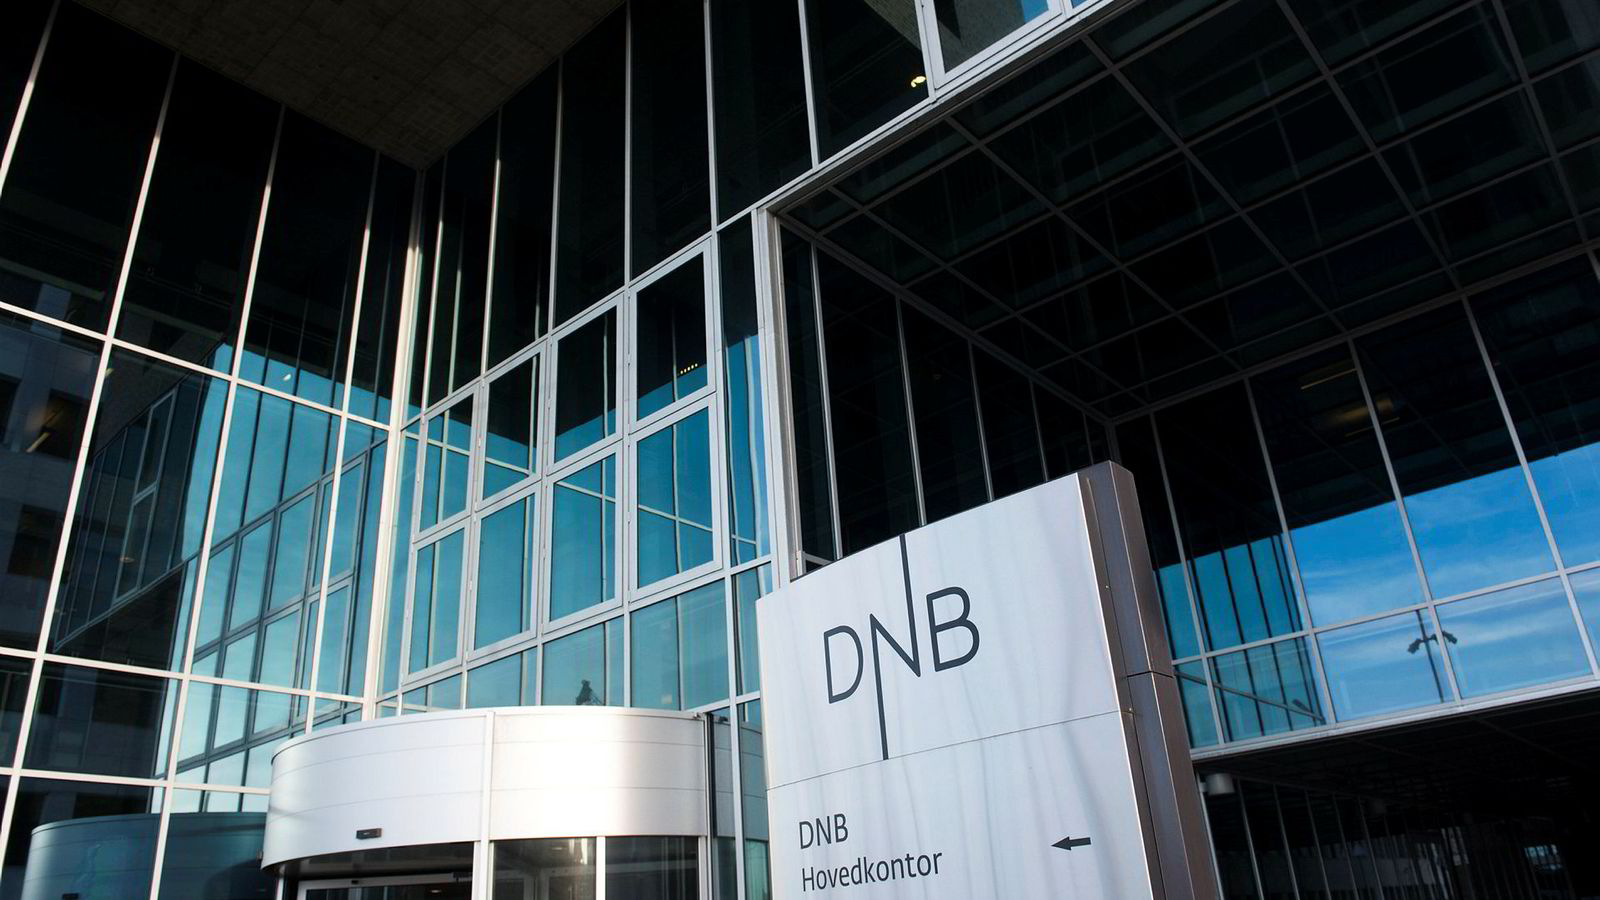 DNB sliter med store tekniske problemer. Mange kunder er belastet dobbelt.